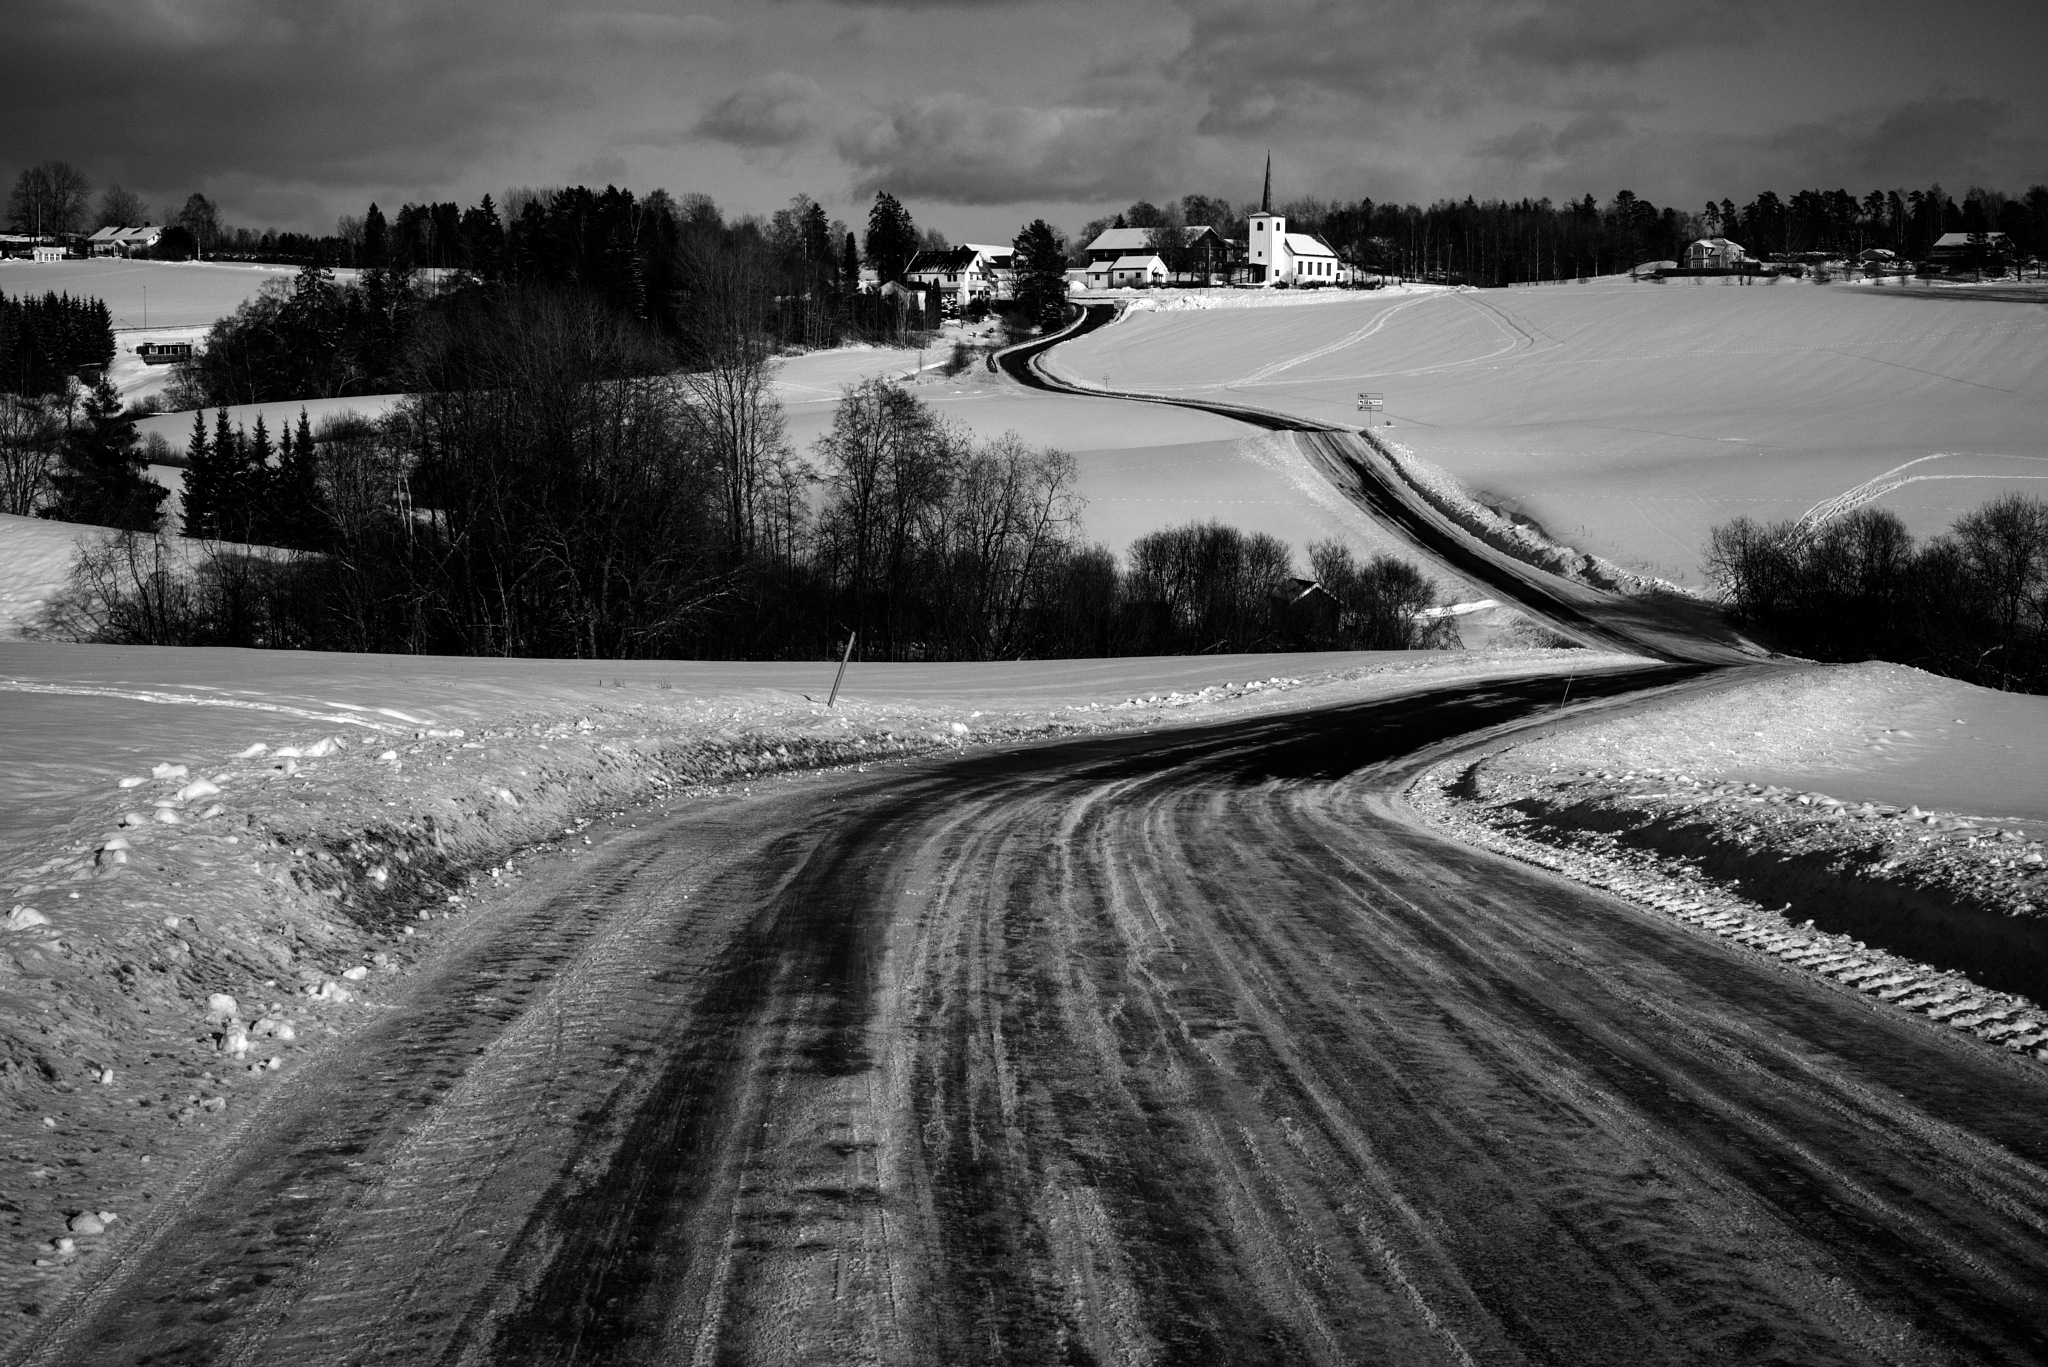 WINTER ROAD TO THE NORTH POLE by Goran Jorganovich